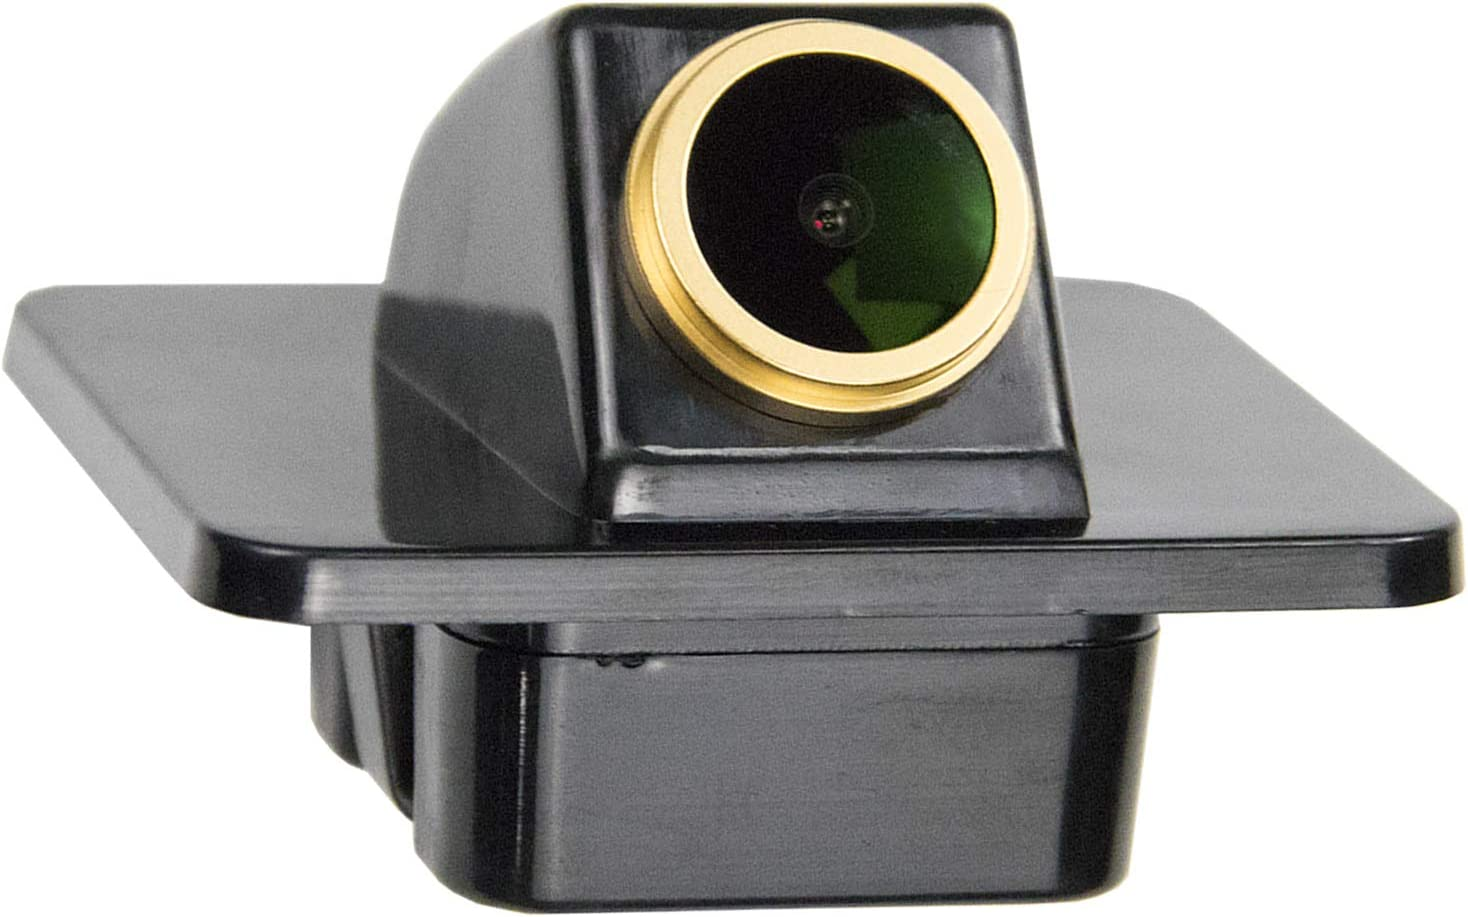 Reverse Hole Replacement Camera HD 1280x720p Rear Reversing Backup Camera Rearview License Plate Camera Night Vision Ip69k Waterproof for Kia Certao//Optima//K5 Hyundai i40 Sedan